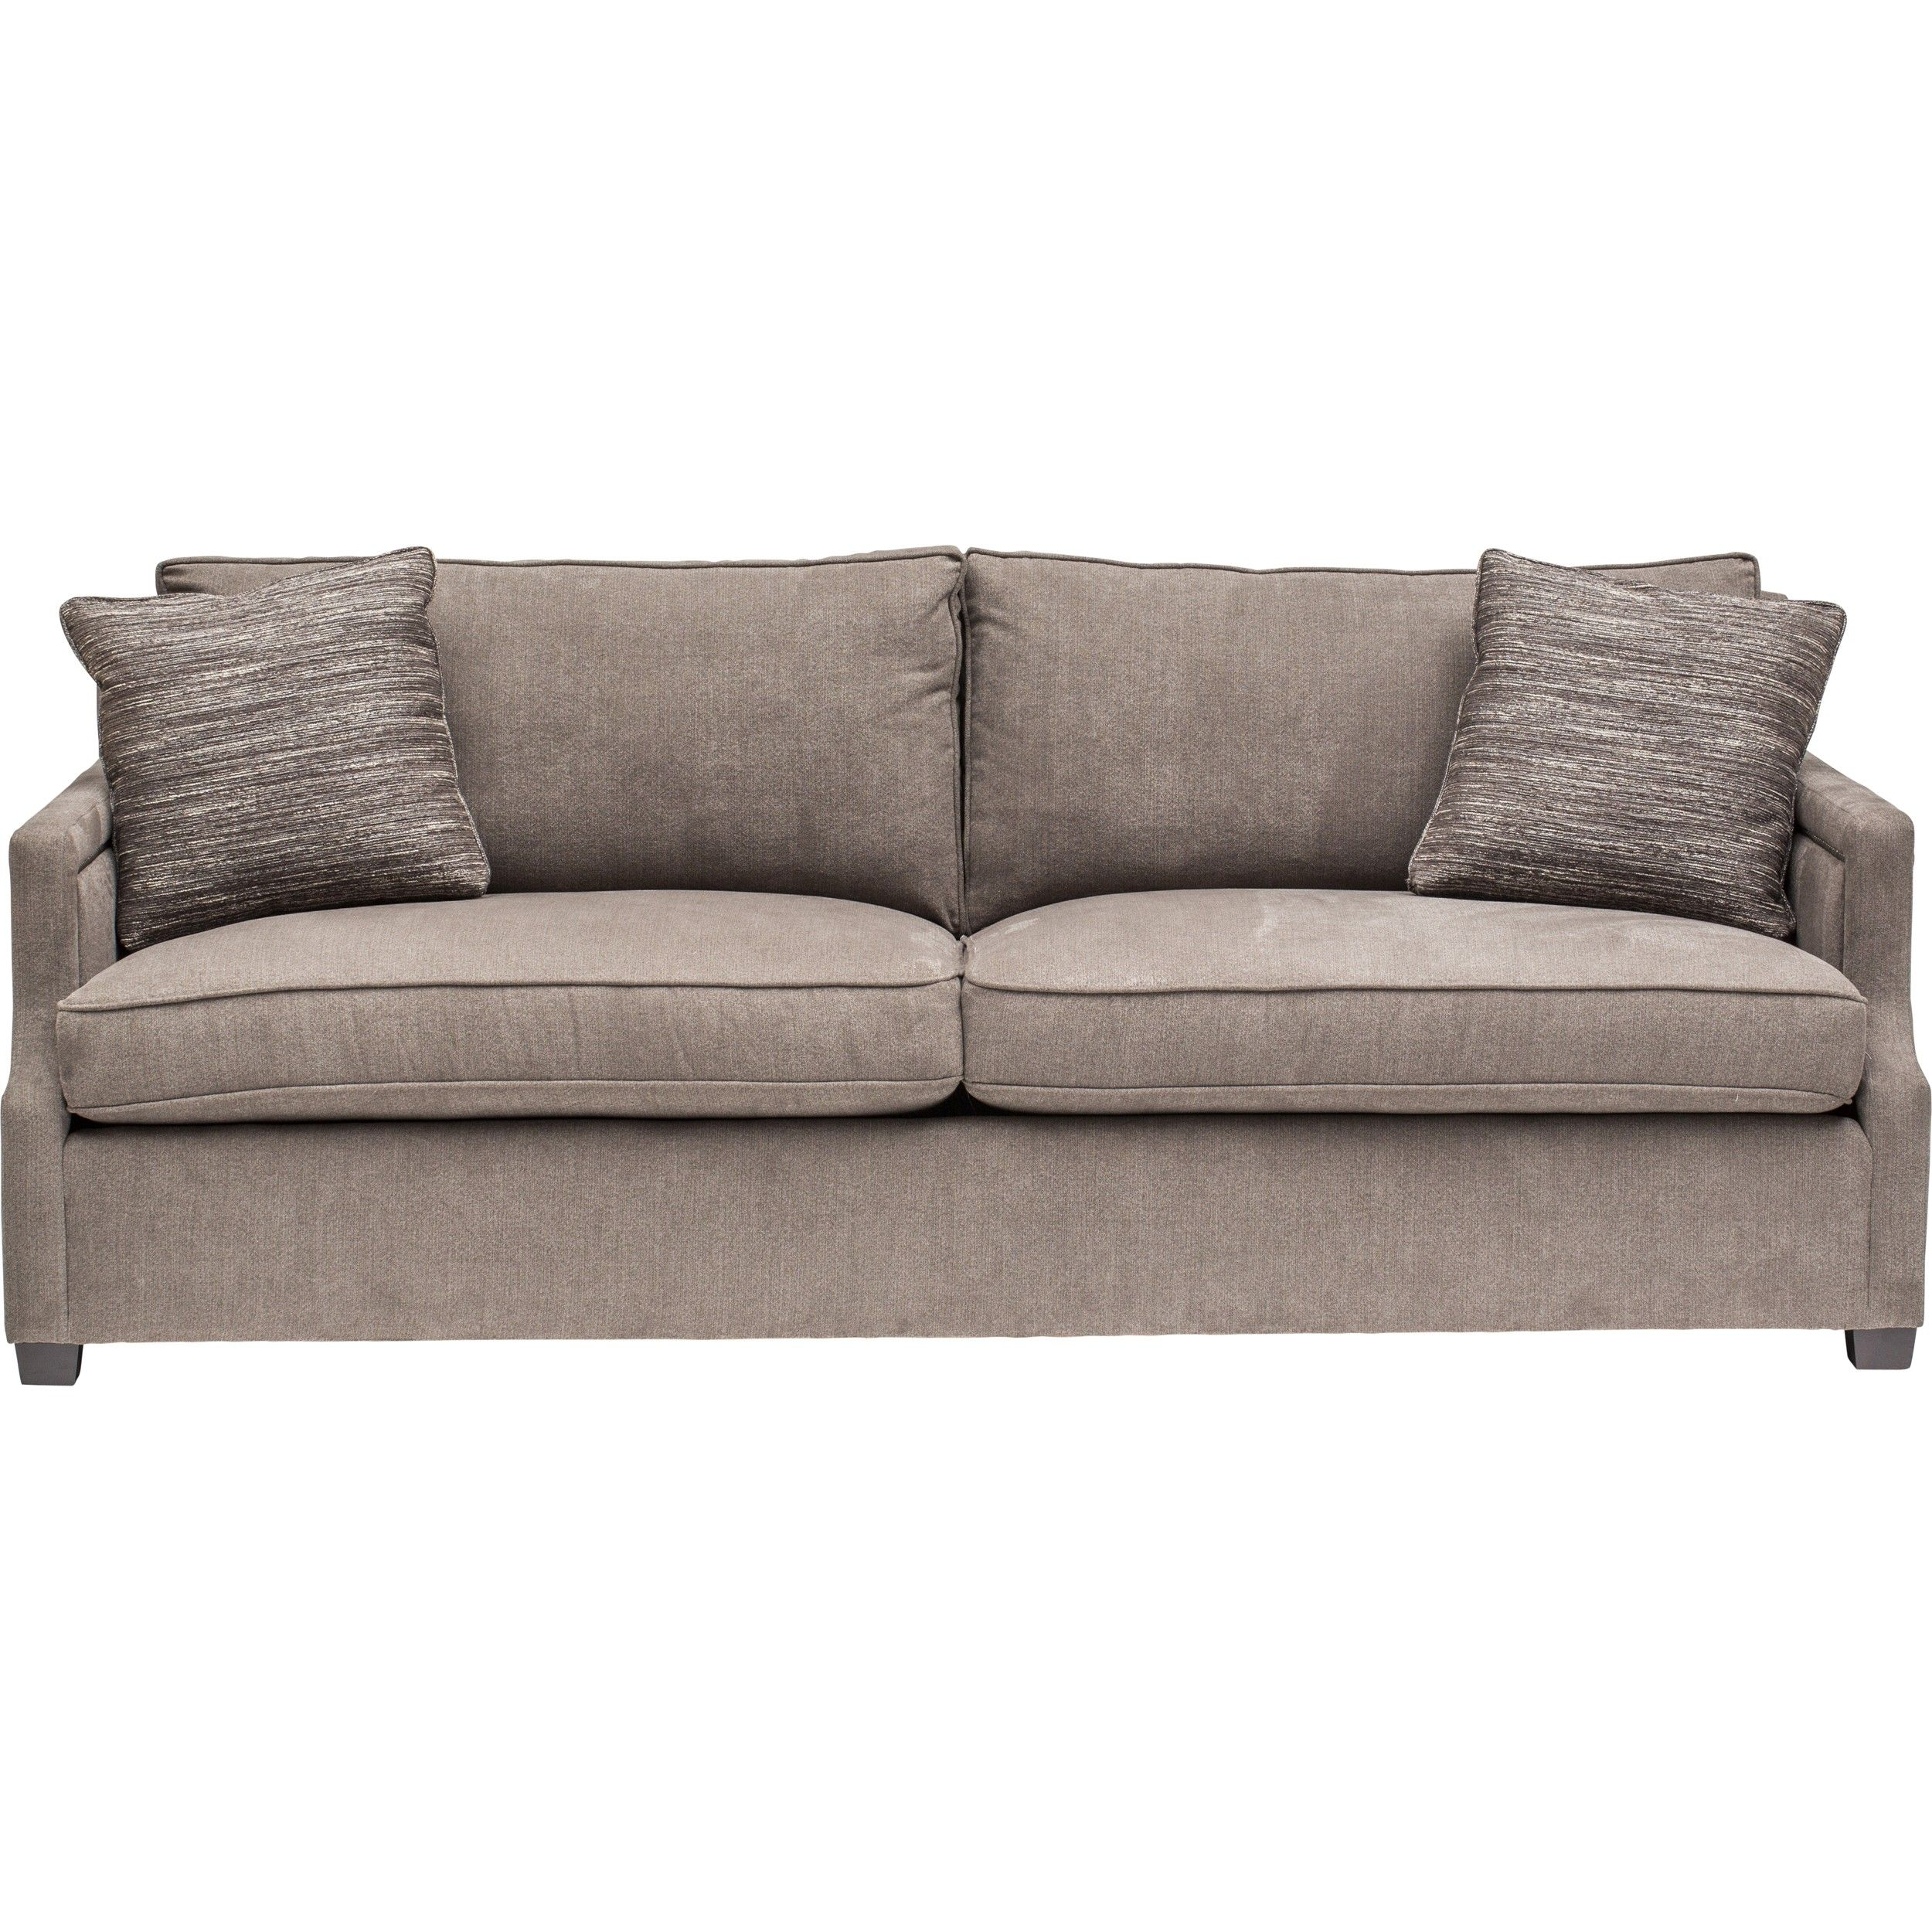 Bernhardt Clinton Sofa Furniture Pinterest